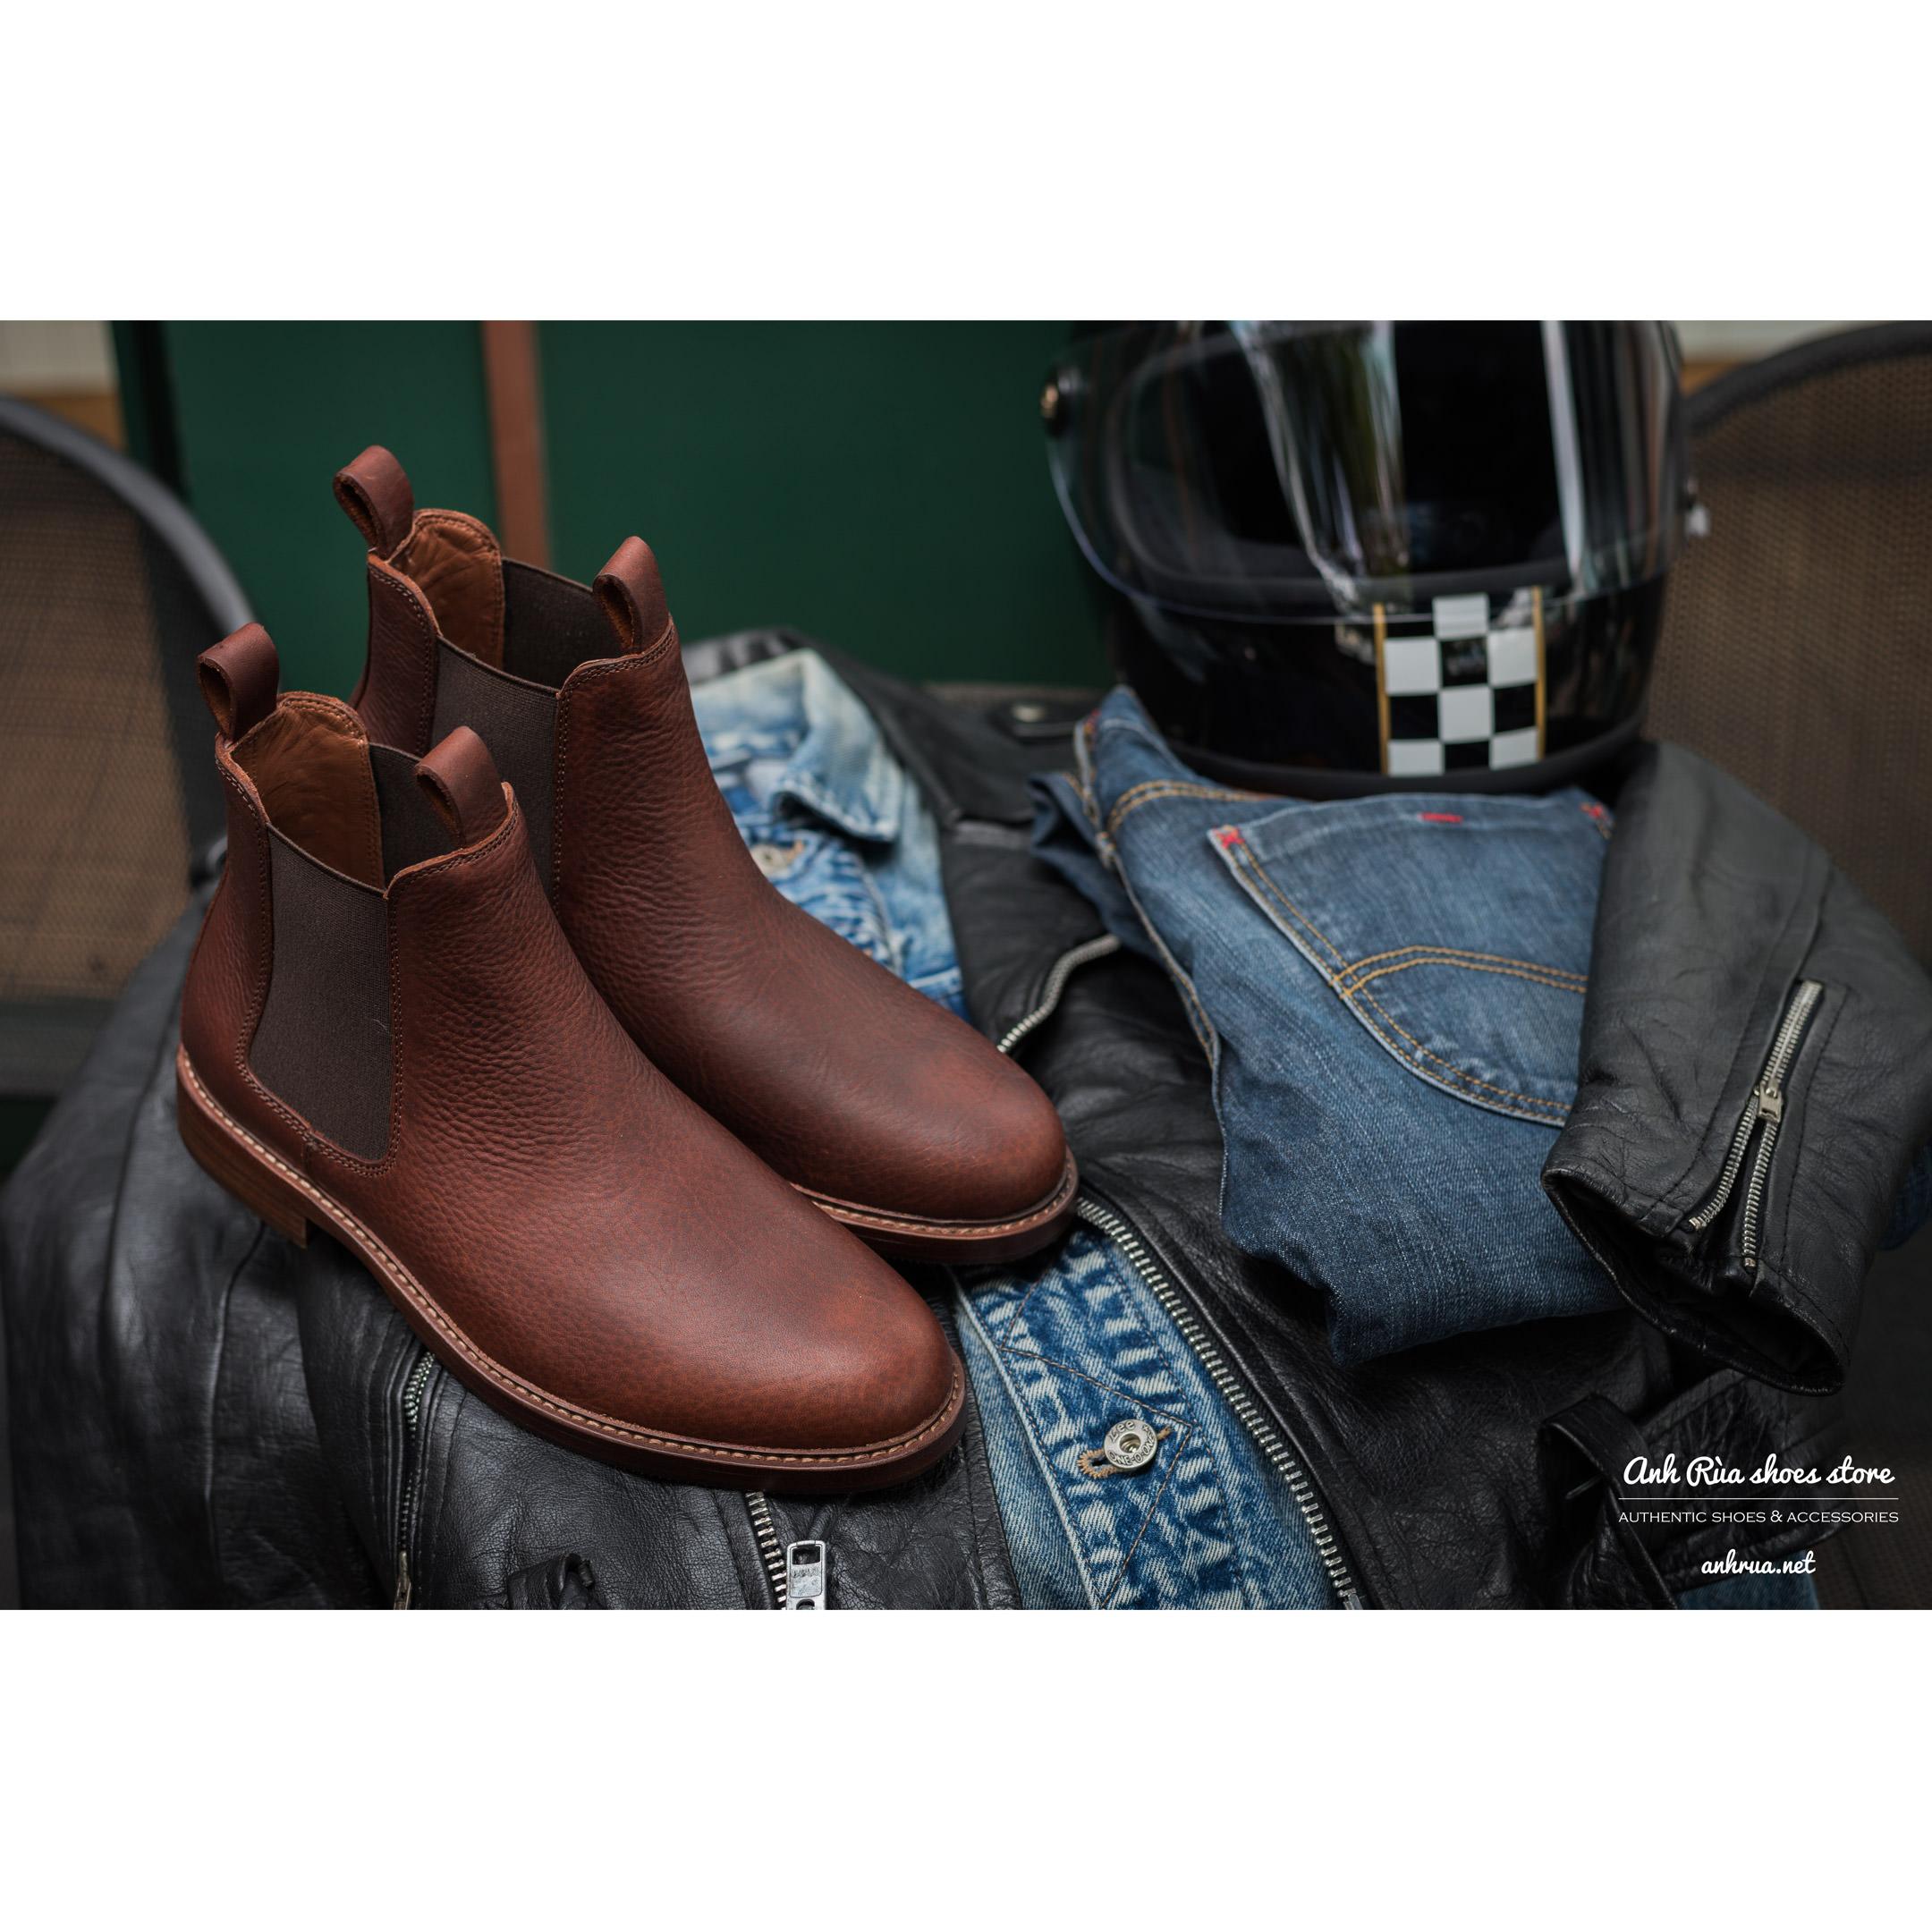 Giày Bốt Nam Pullup Cognac Chelsea Boots Polo Ralph Lauren